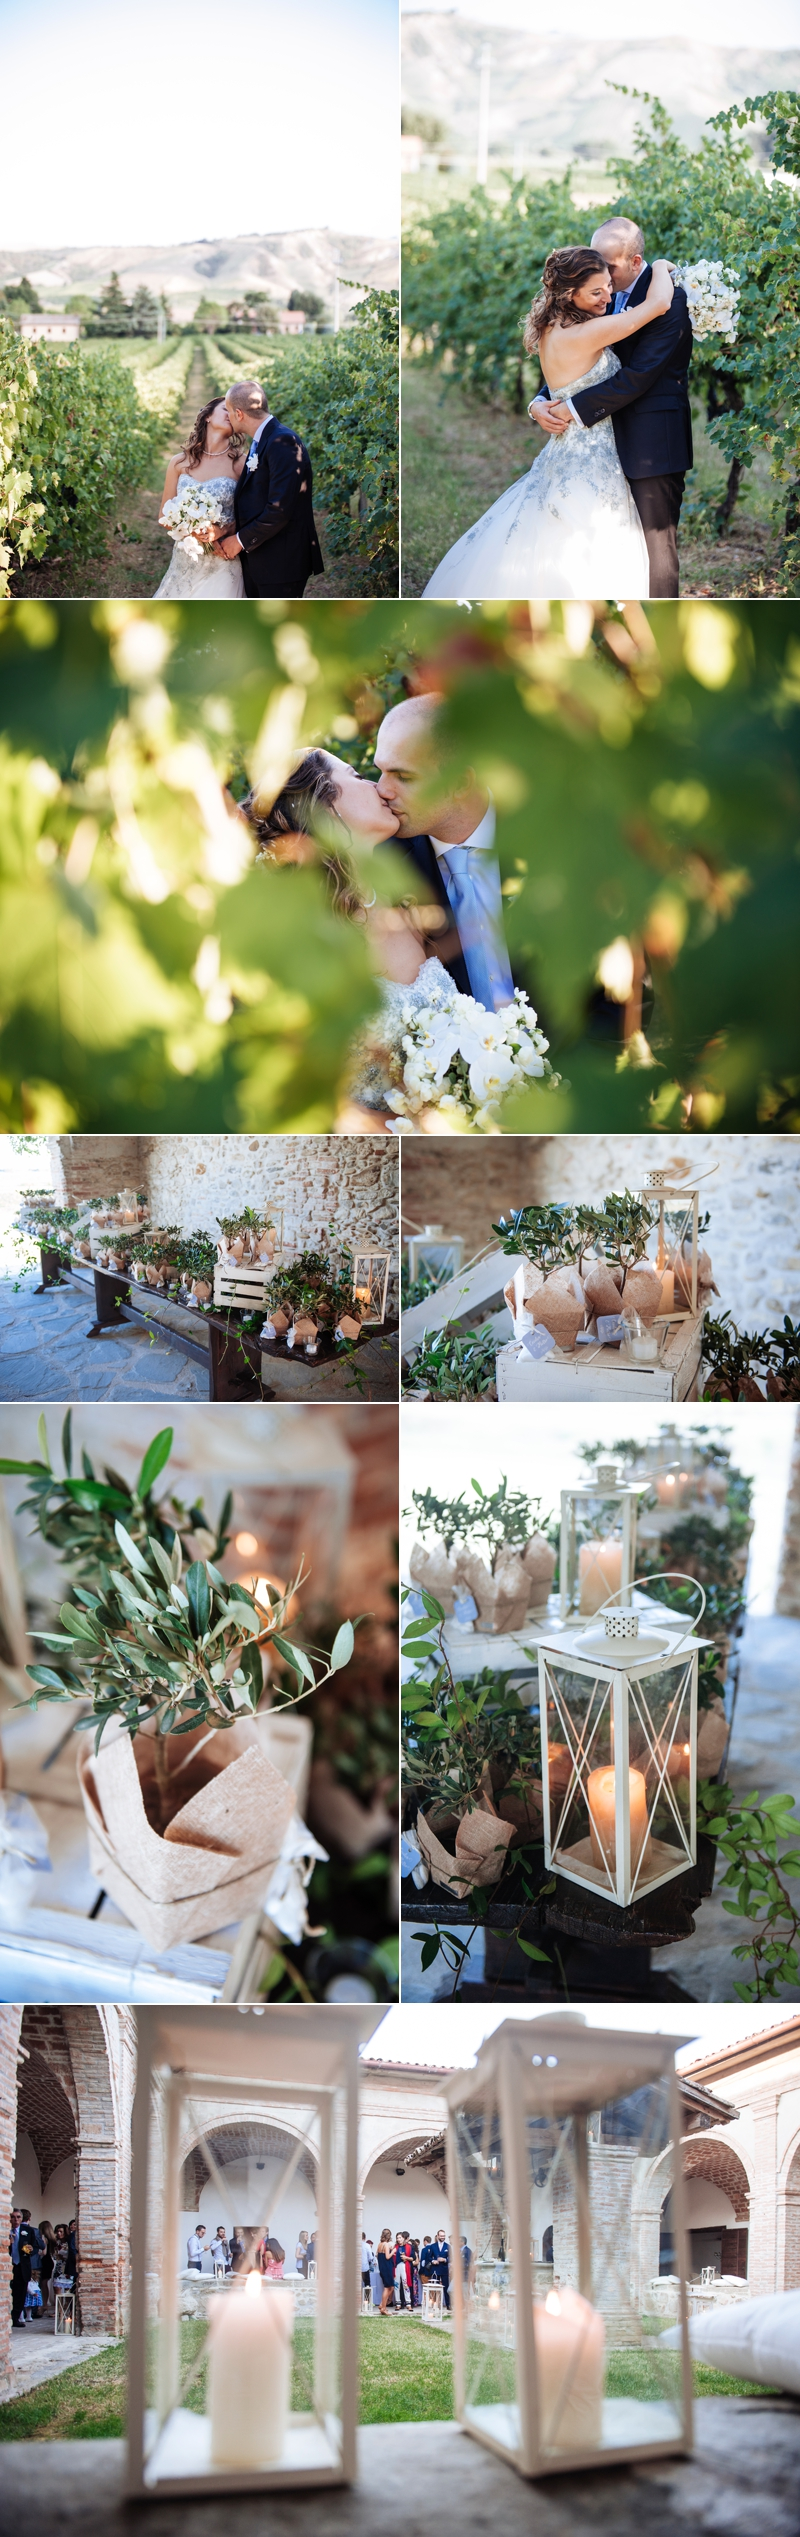 Fotografo Matrimonio Pieve del Tho Brisighella Monastero Scardavilla Meldola Valentina Cavallini 8